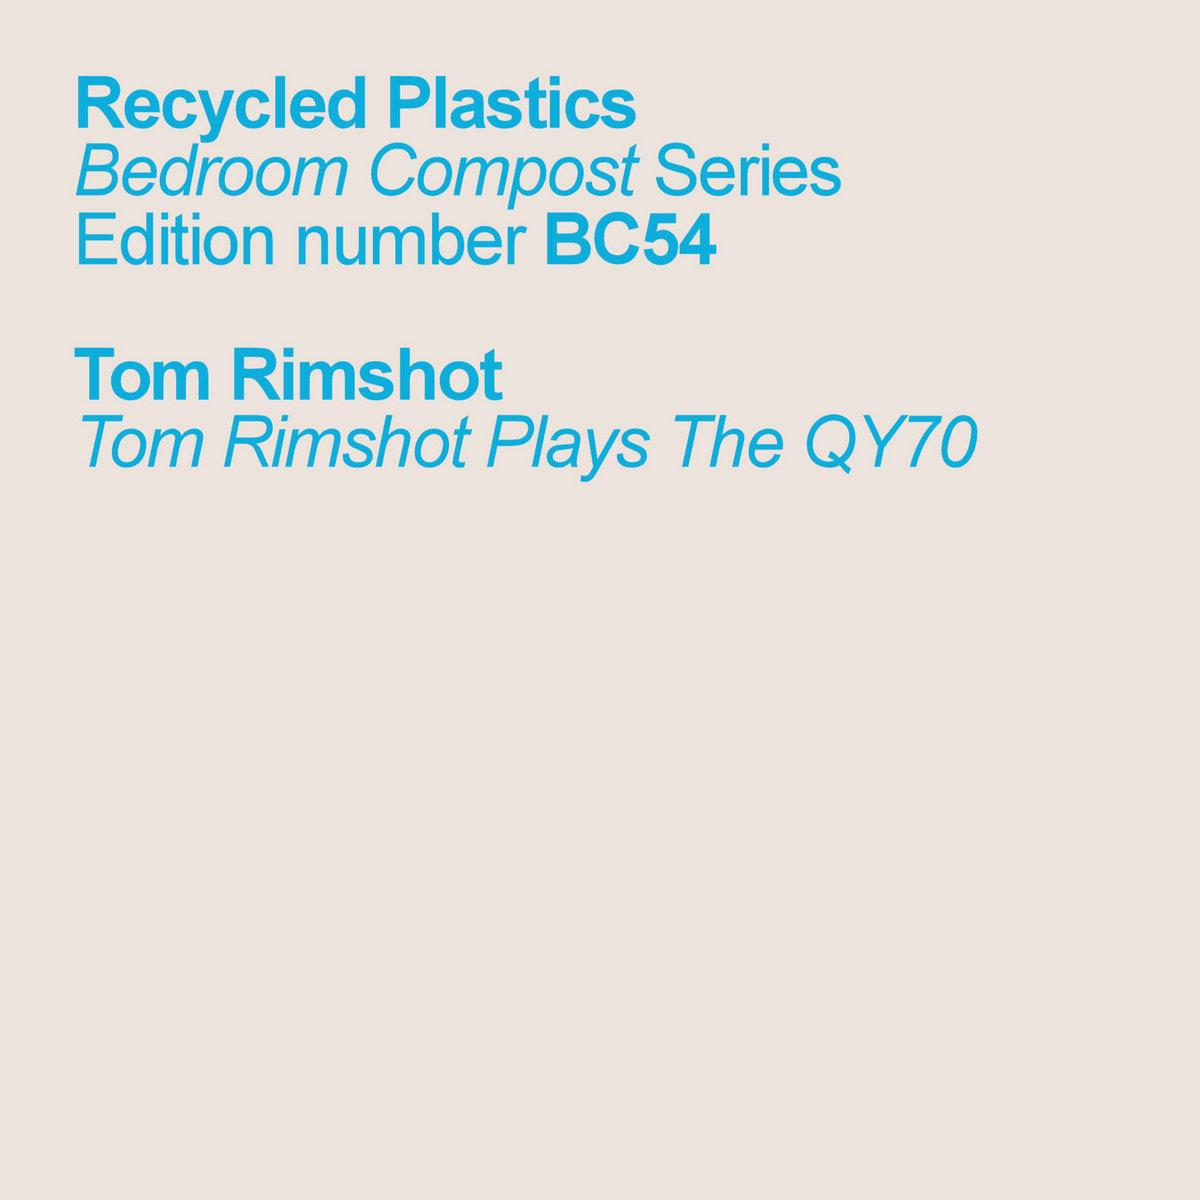 Tom Rimshot Plays The QY70 | Recycled Plastics